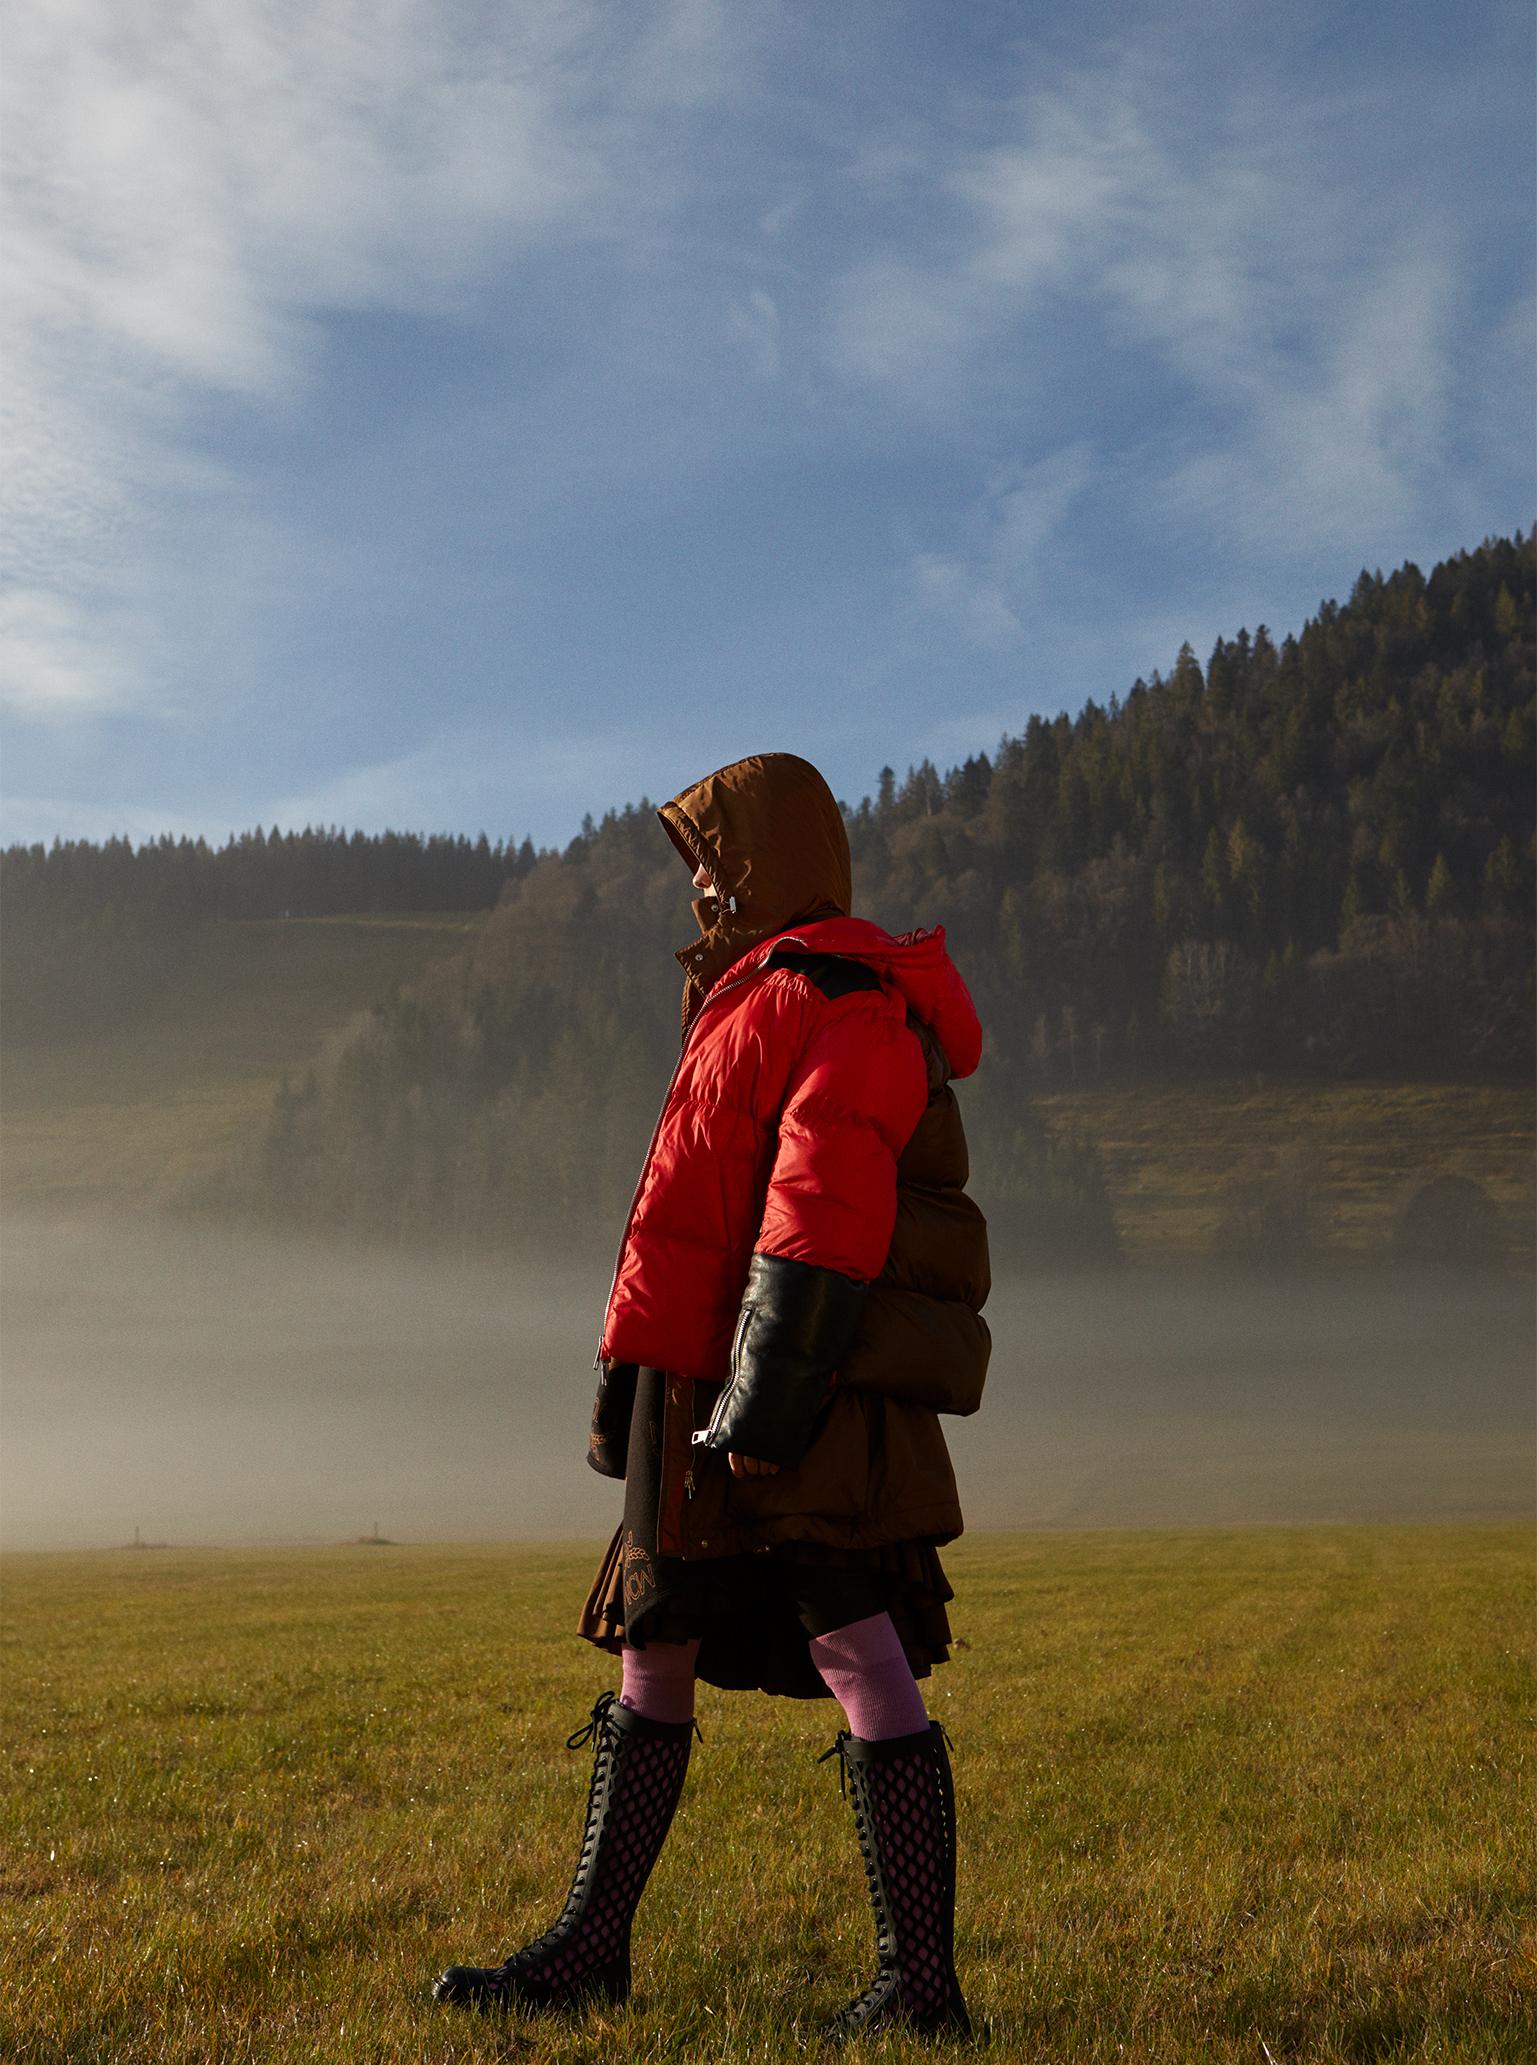 of fog and falls Maike Inga im Schwarzwald auf der Wiese im Nebel